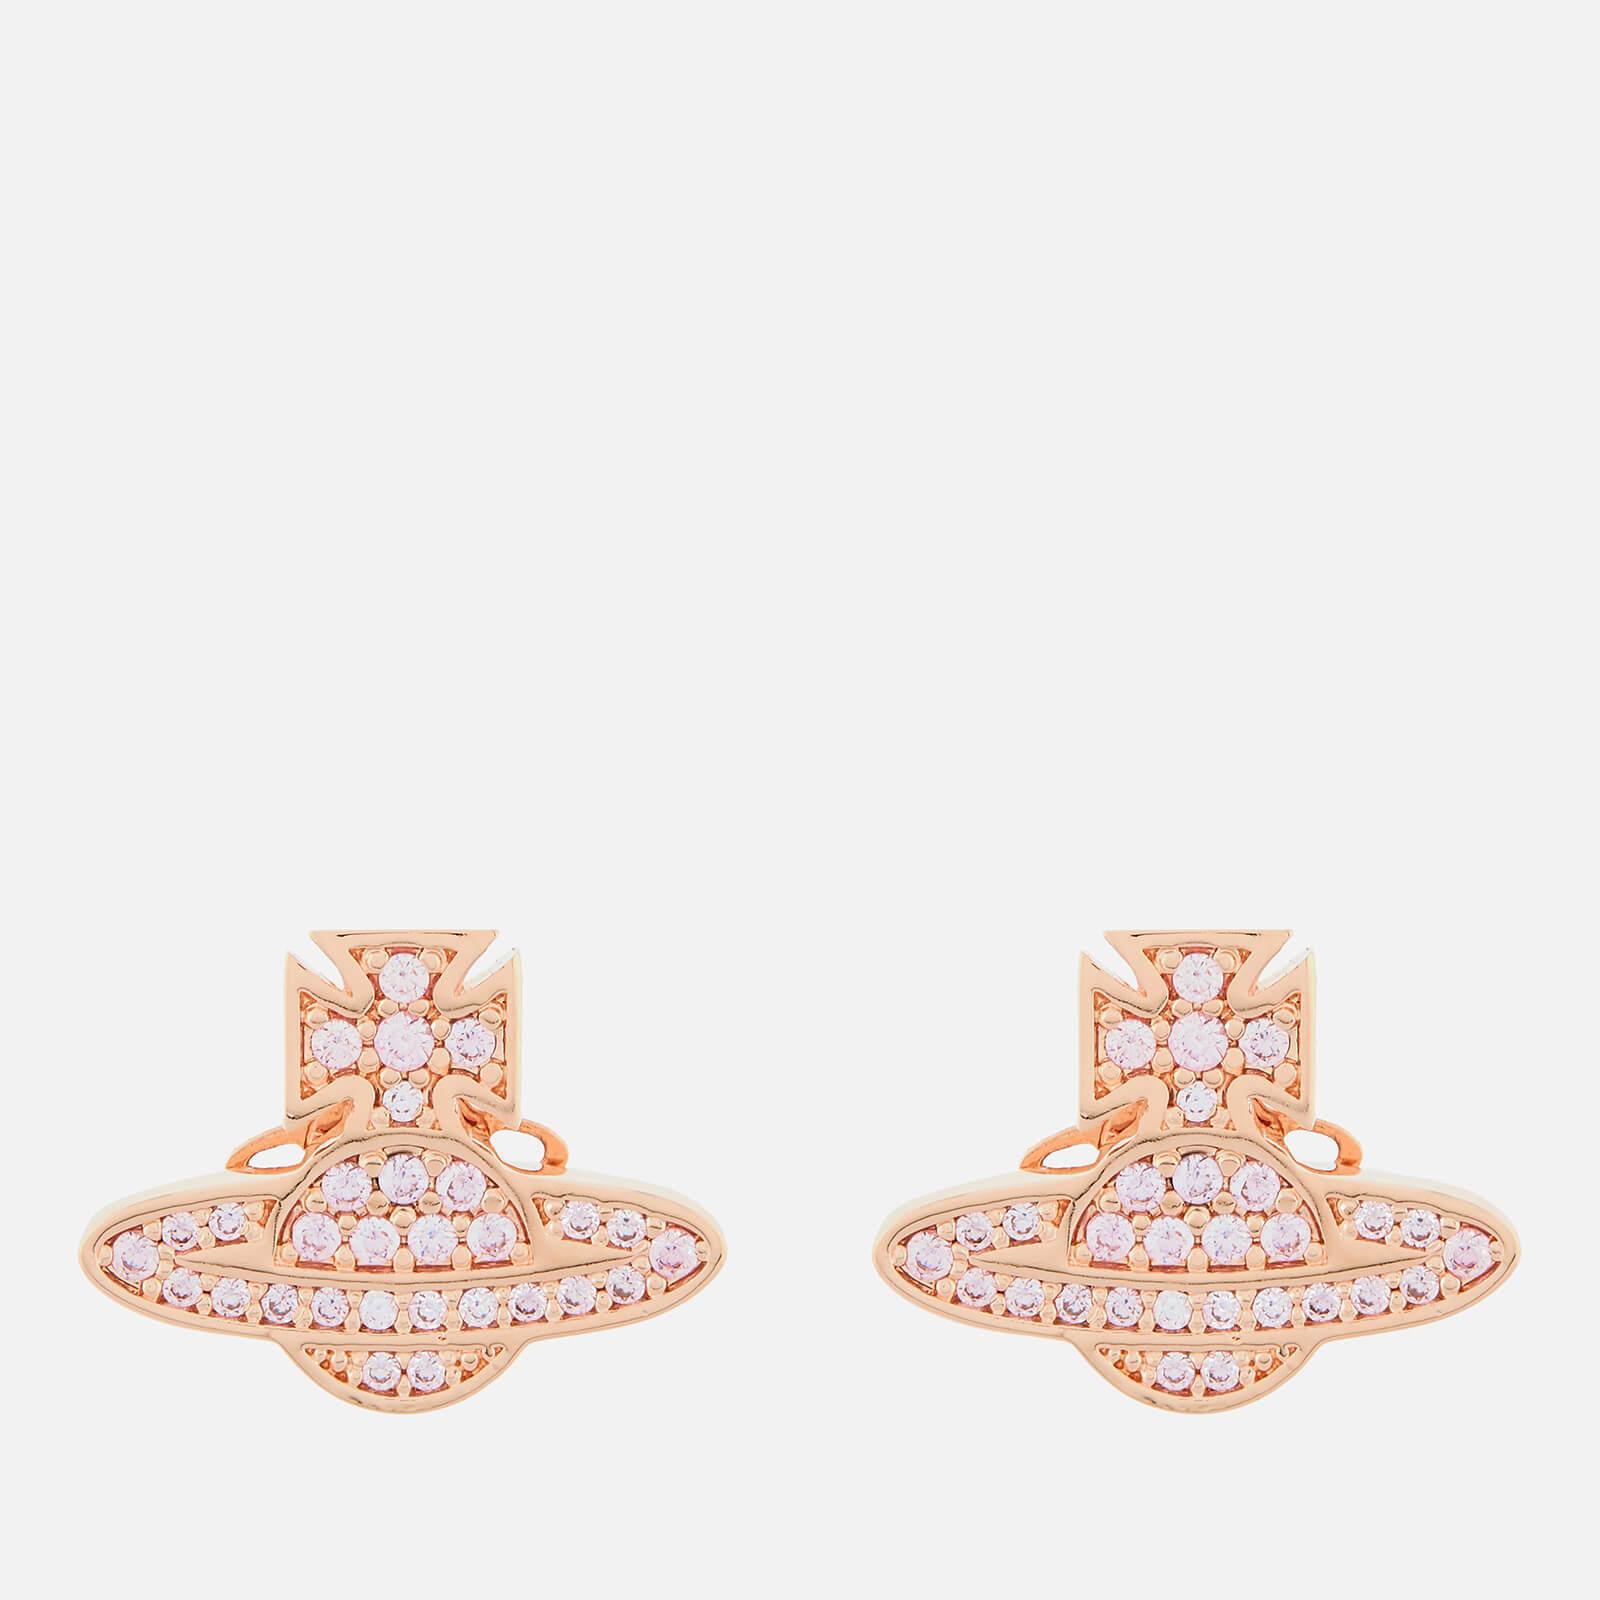 Vivienne Westwood Women's Romina Pave Orb Earrings - Pink Gold